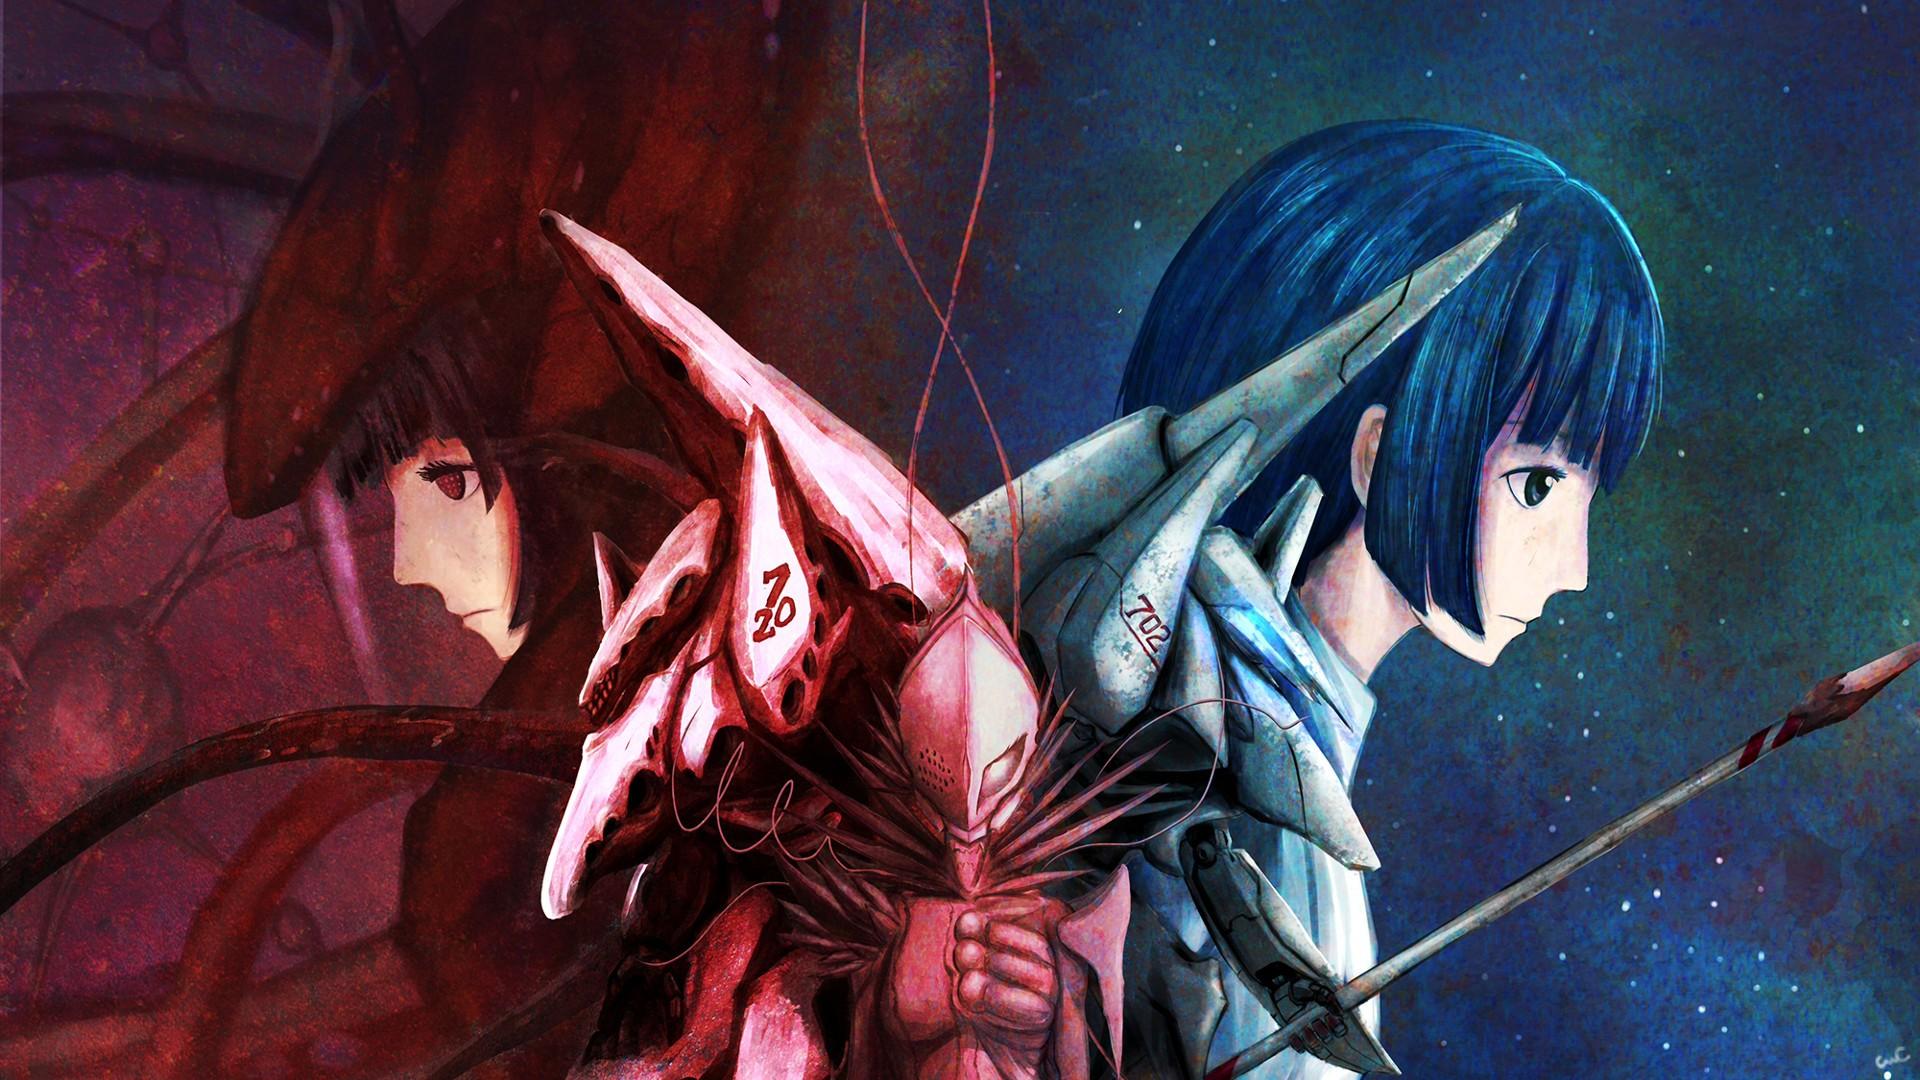 Kumpulan Gambar Hd Anime Manga Gratis Terbaru